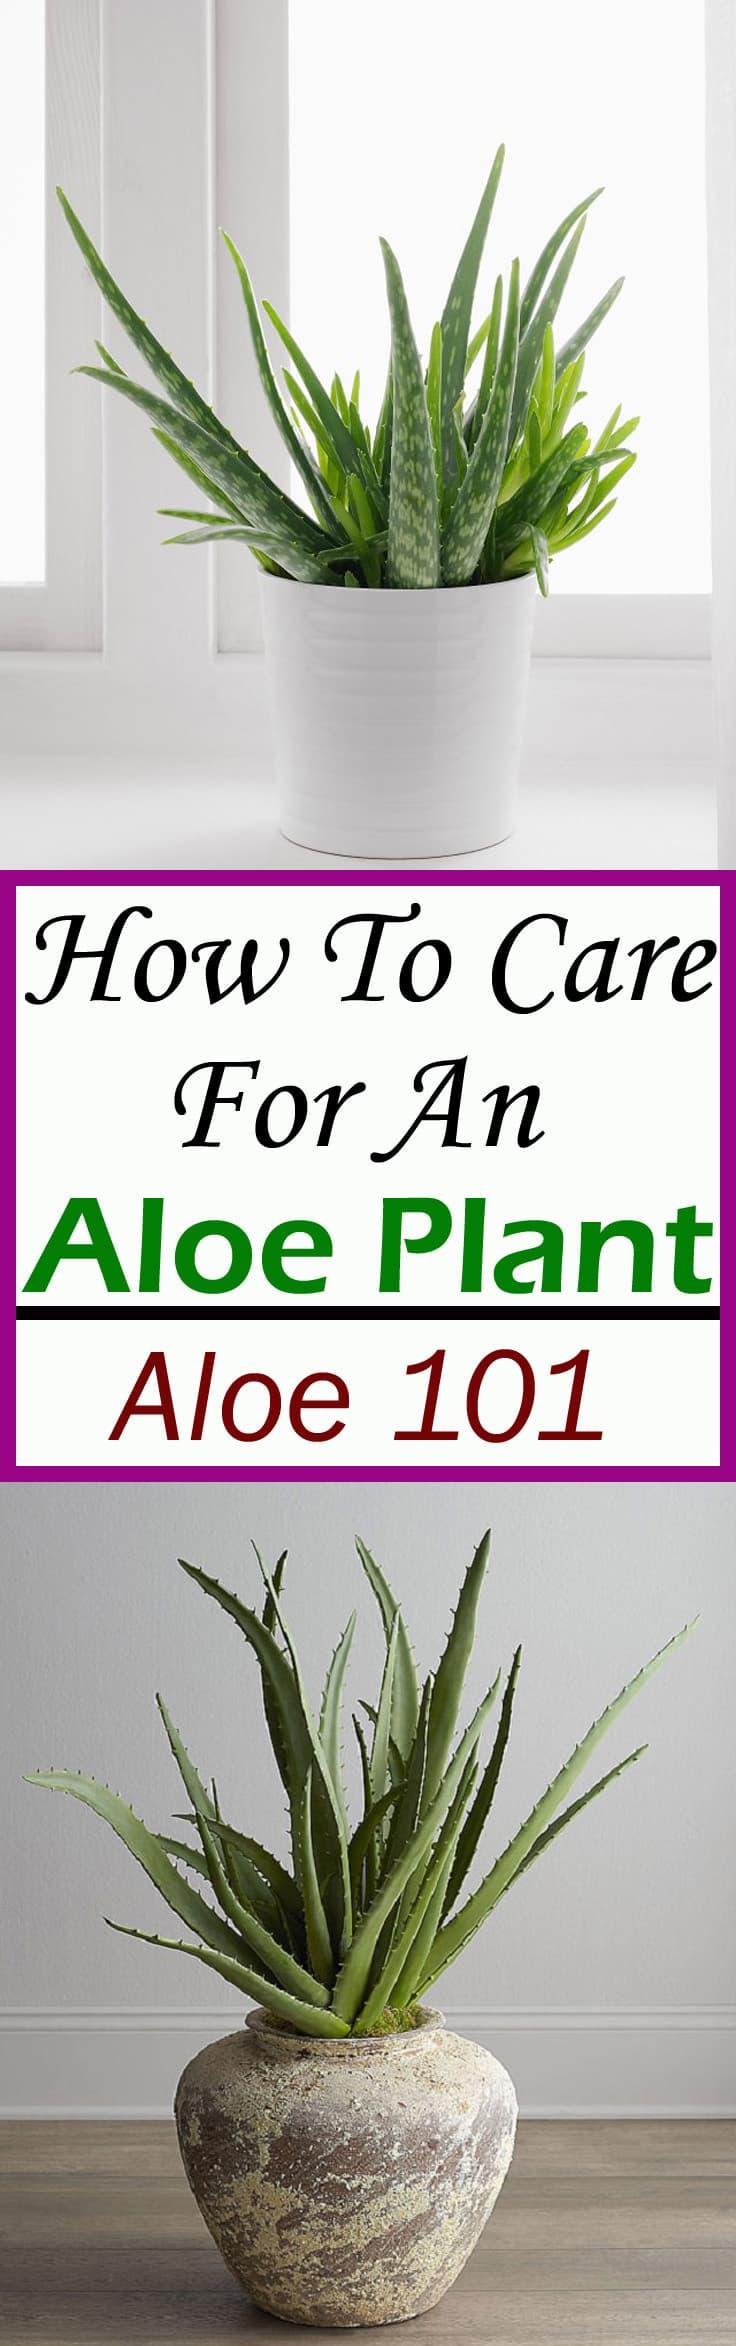 How To Care For An Aloe Plant Aloe Plant Care Balcony